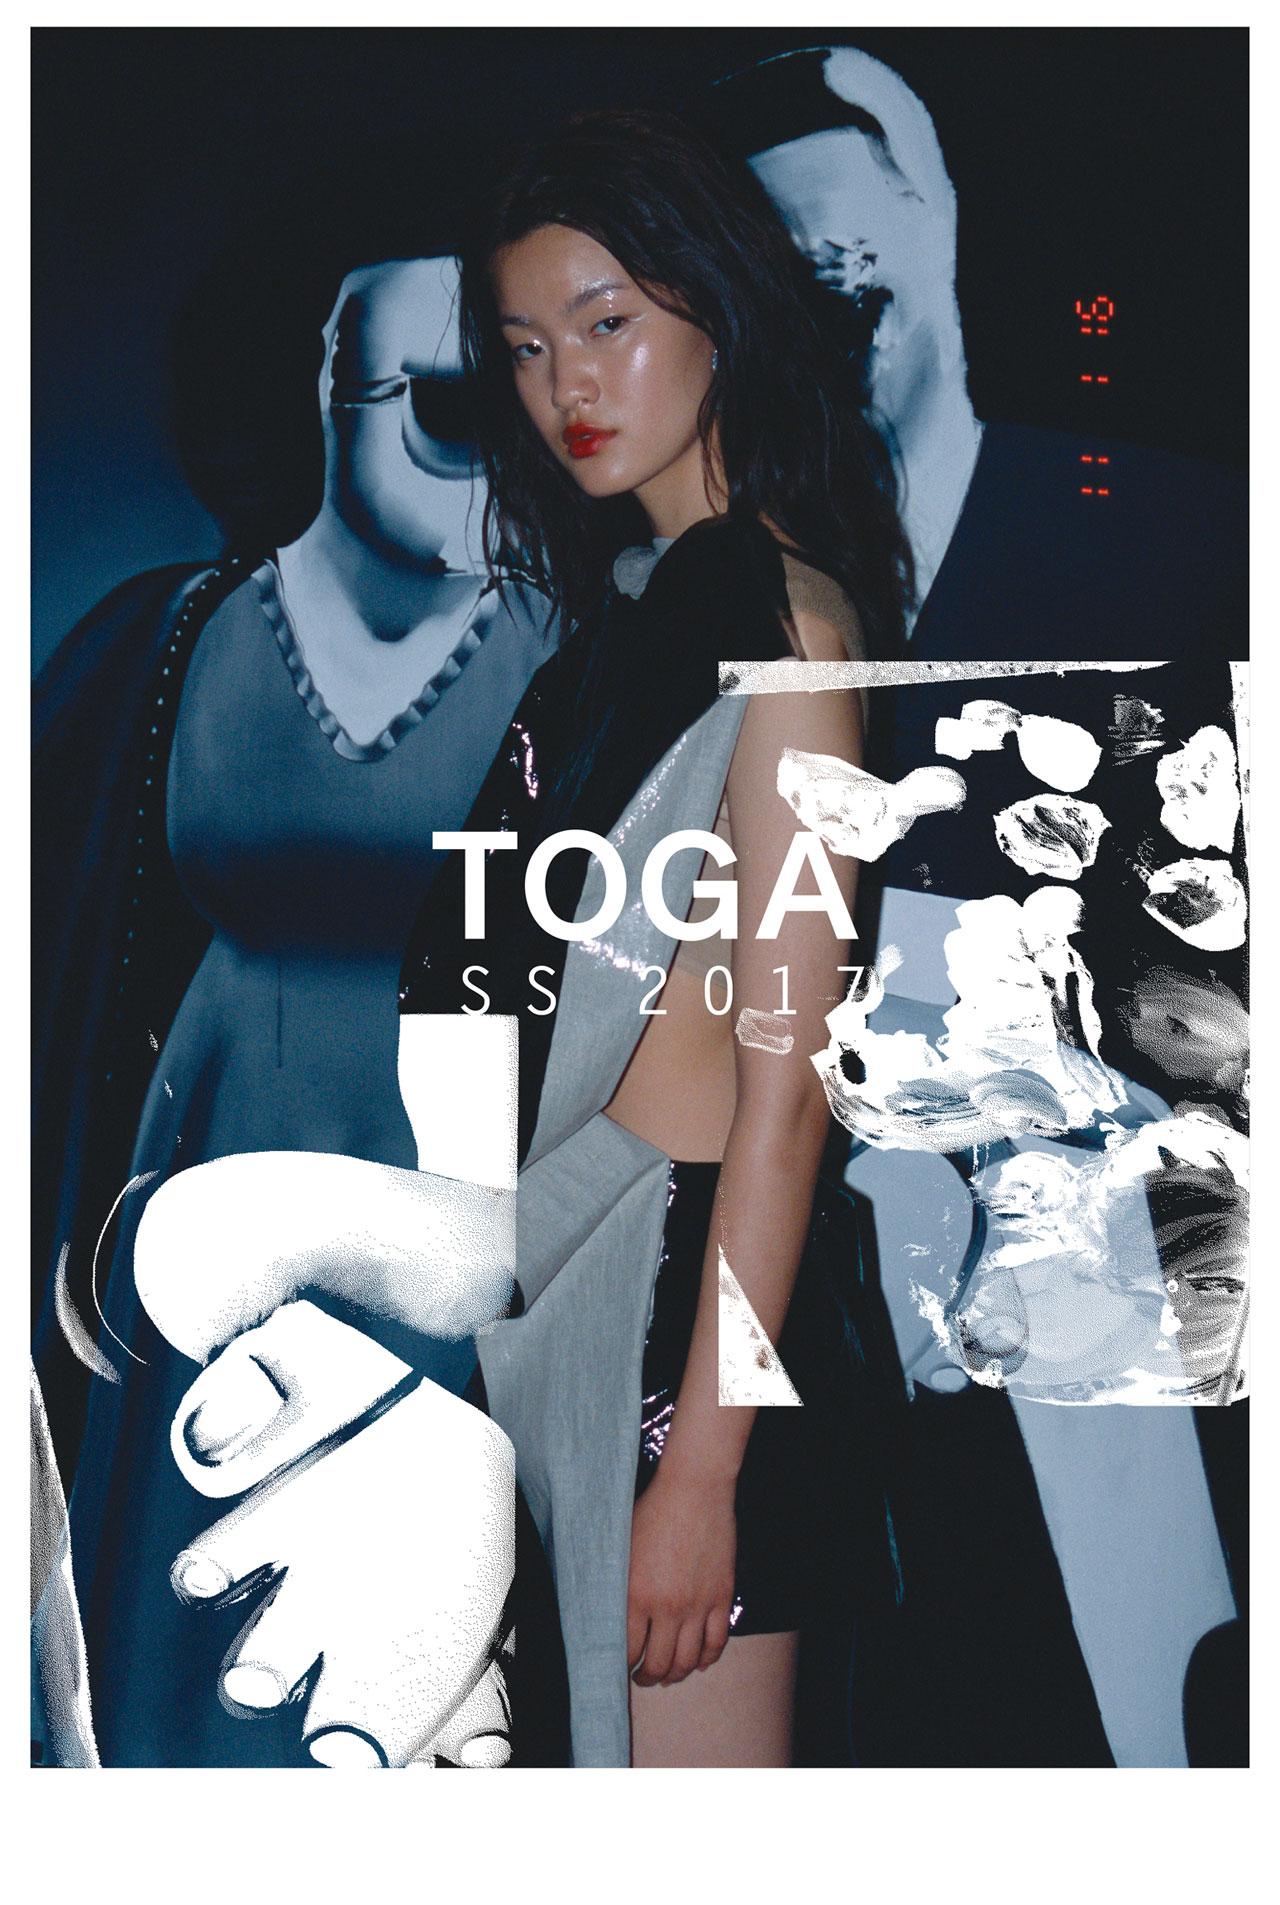 © TOGA